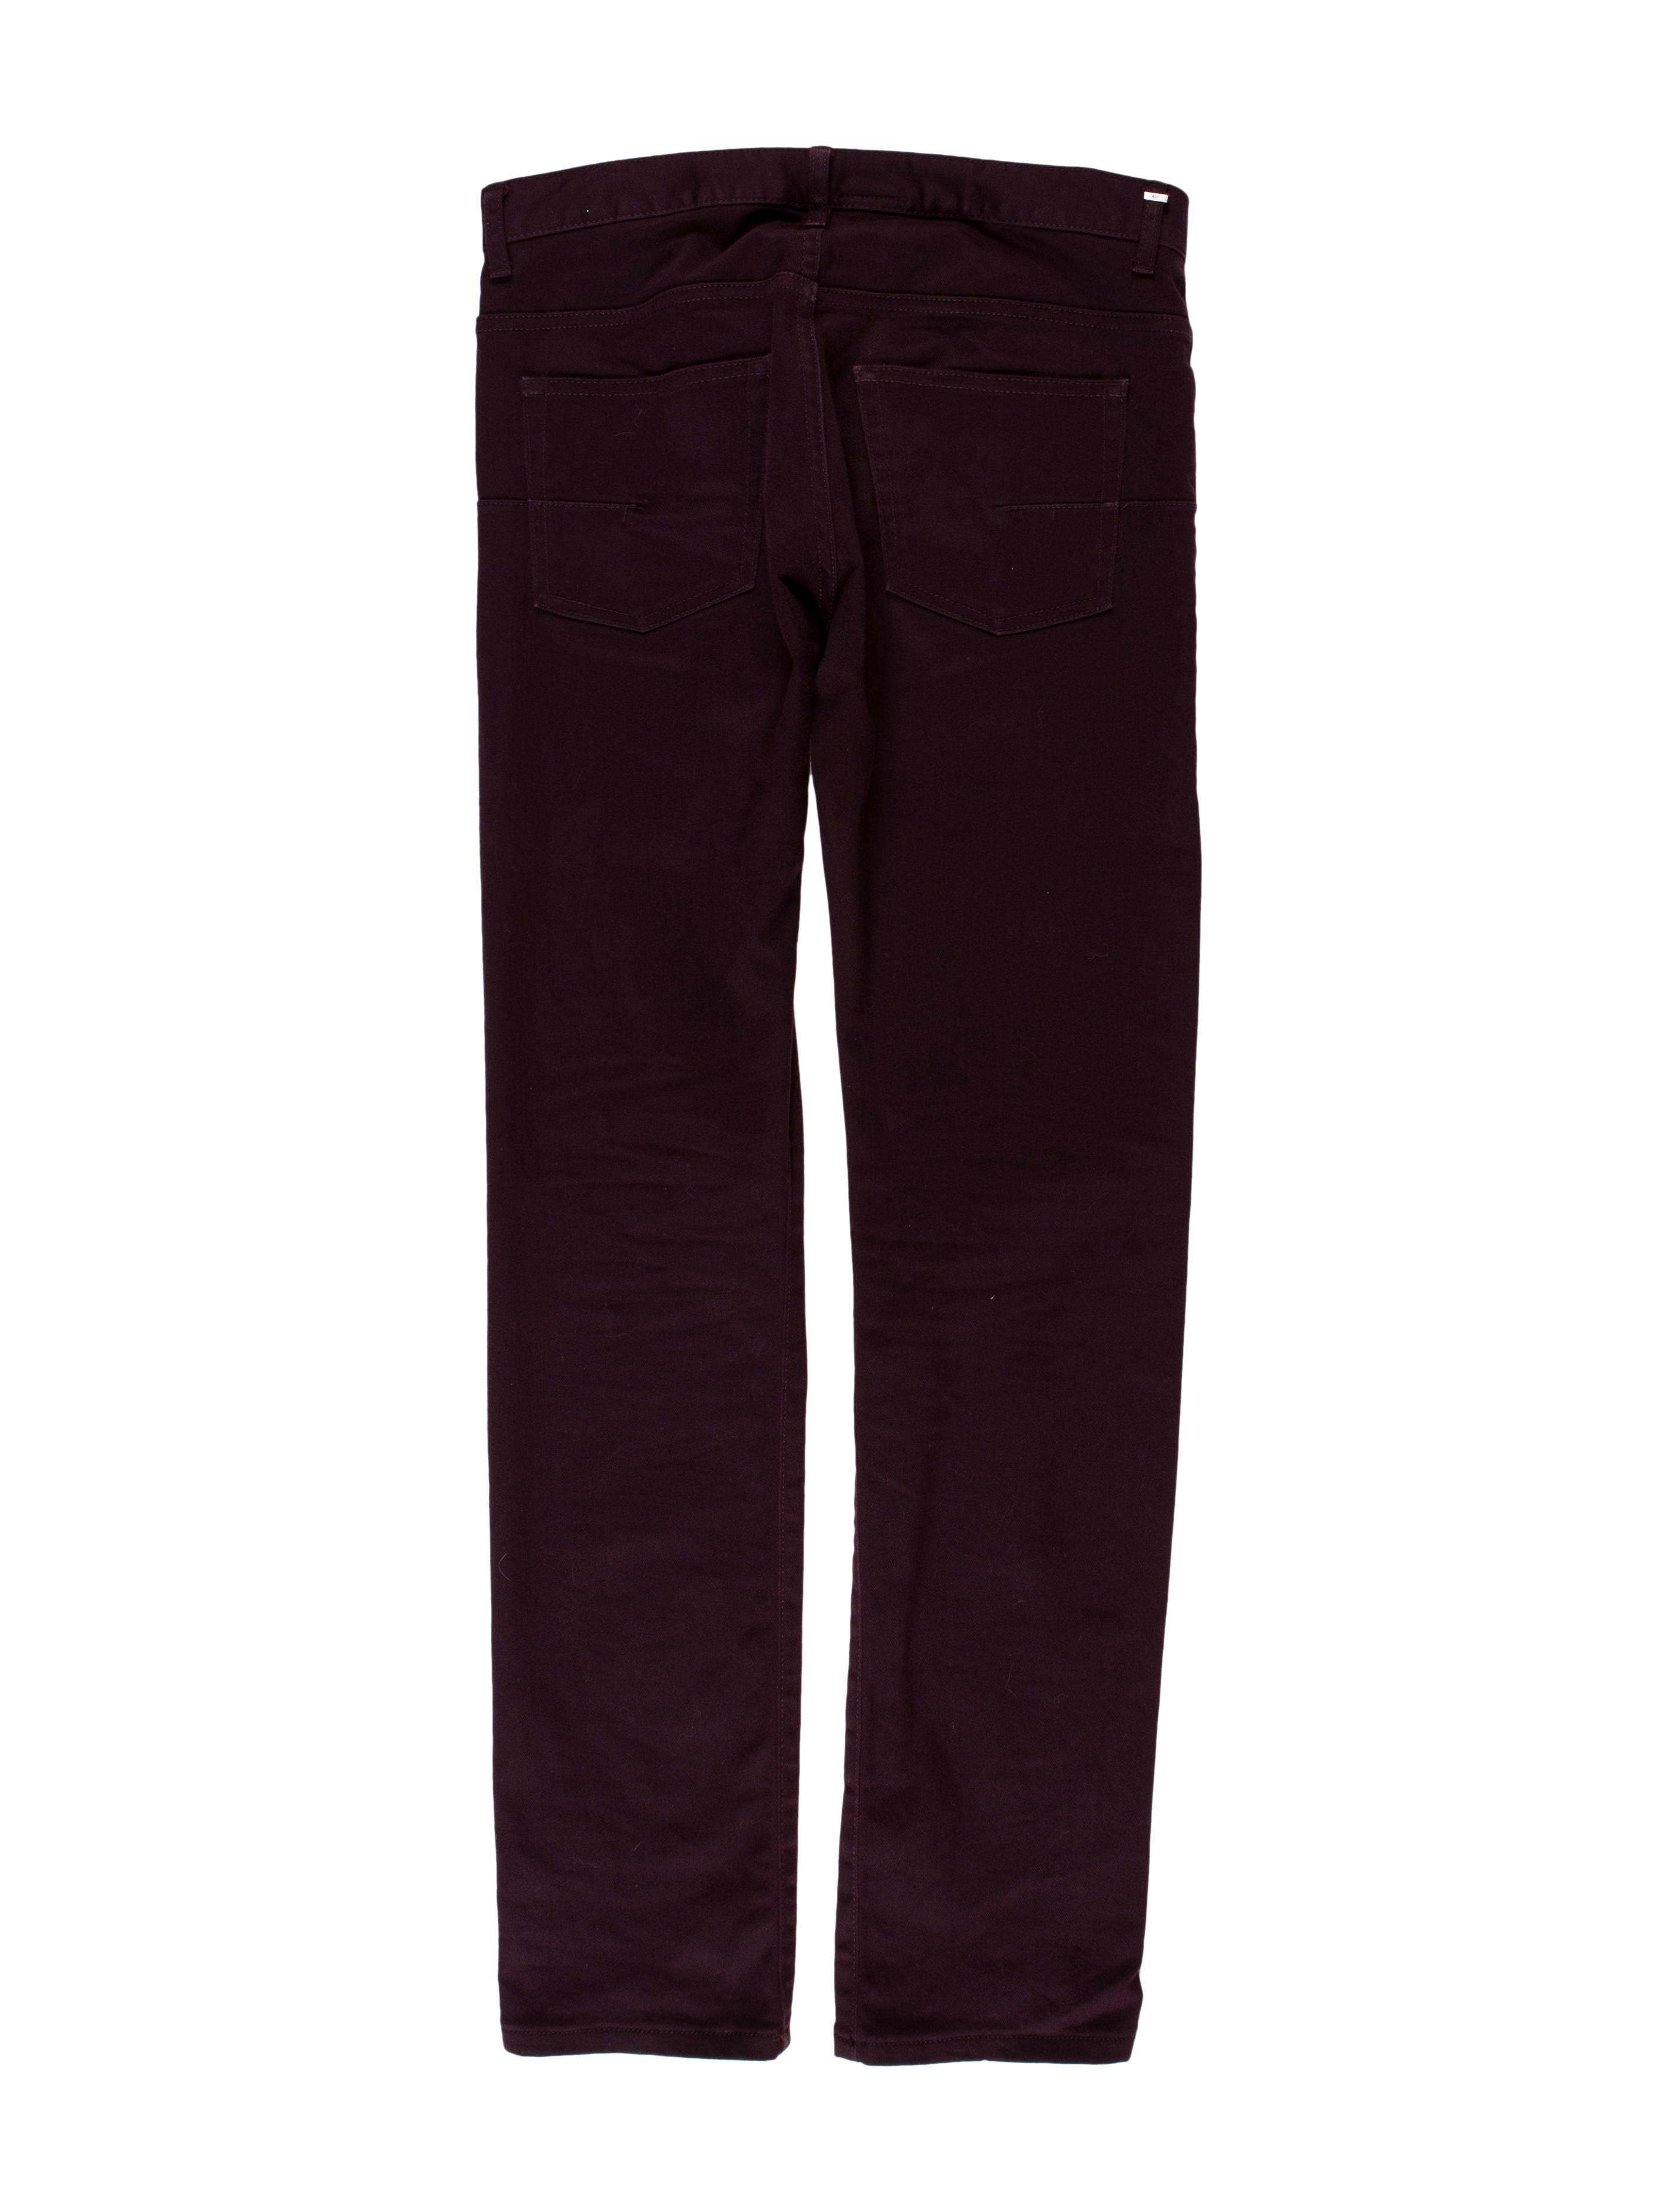 dior homme 2008 slim fit jeans clothing chr62953 the realreal. Black Bedroom Furniture Sets. Home Design Ideas